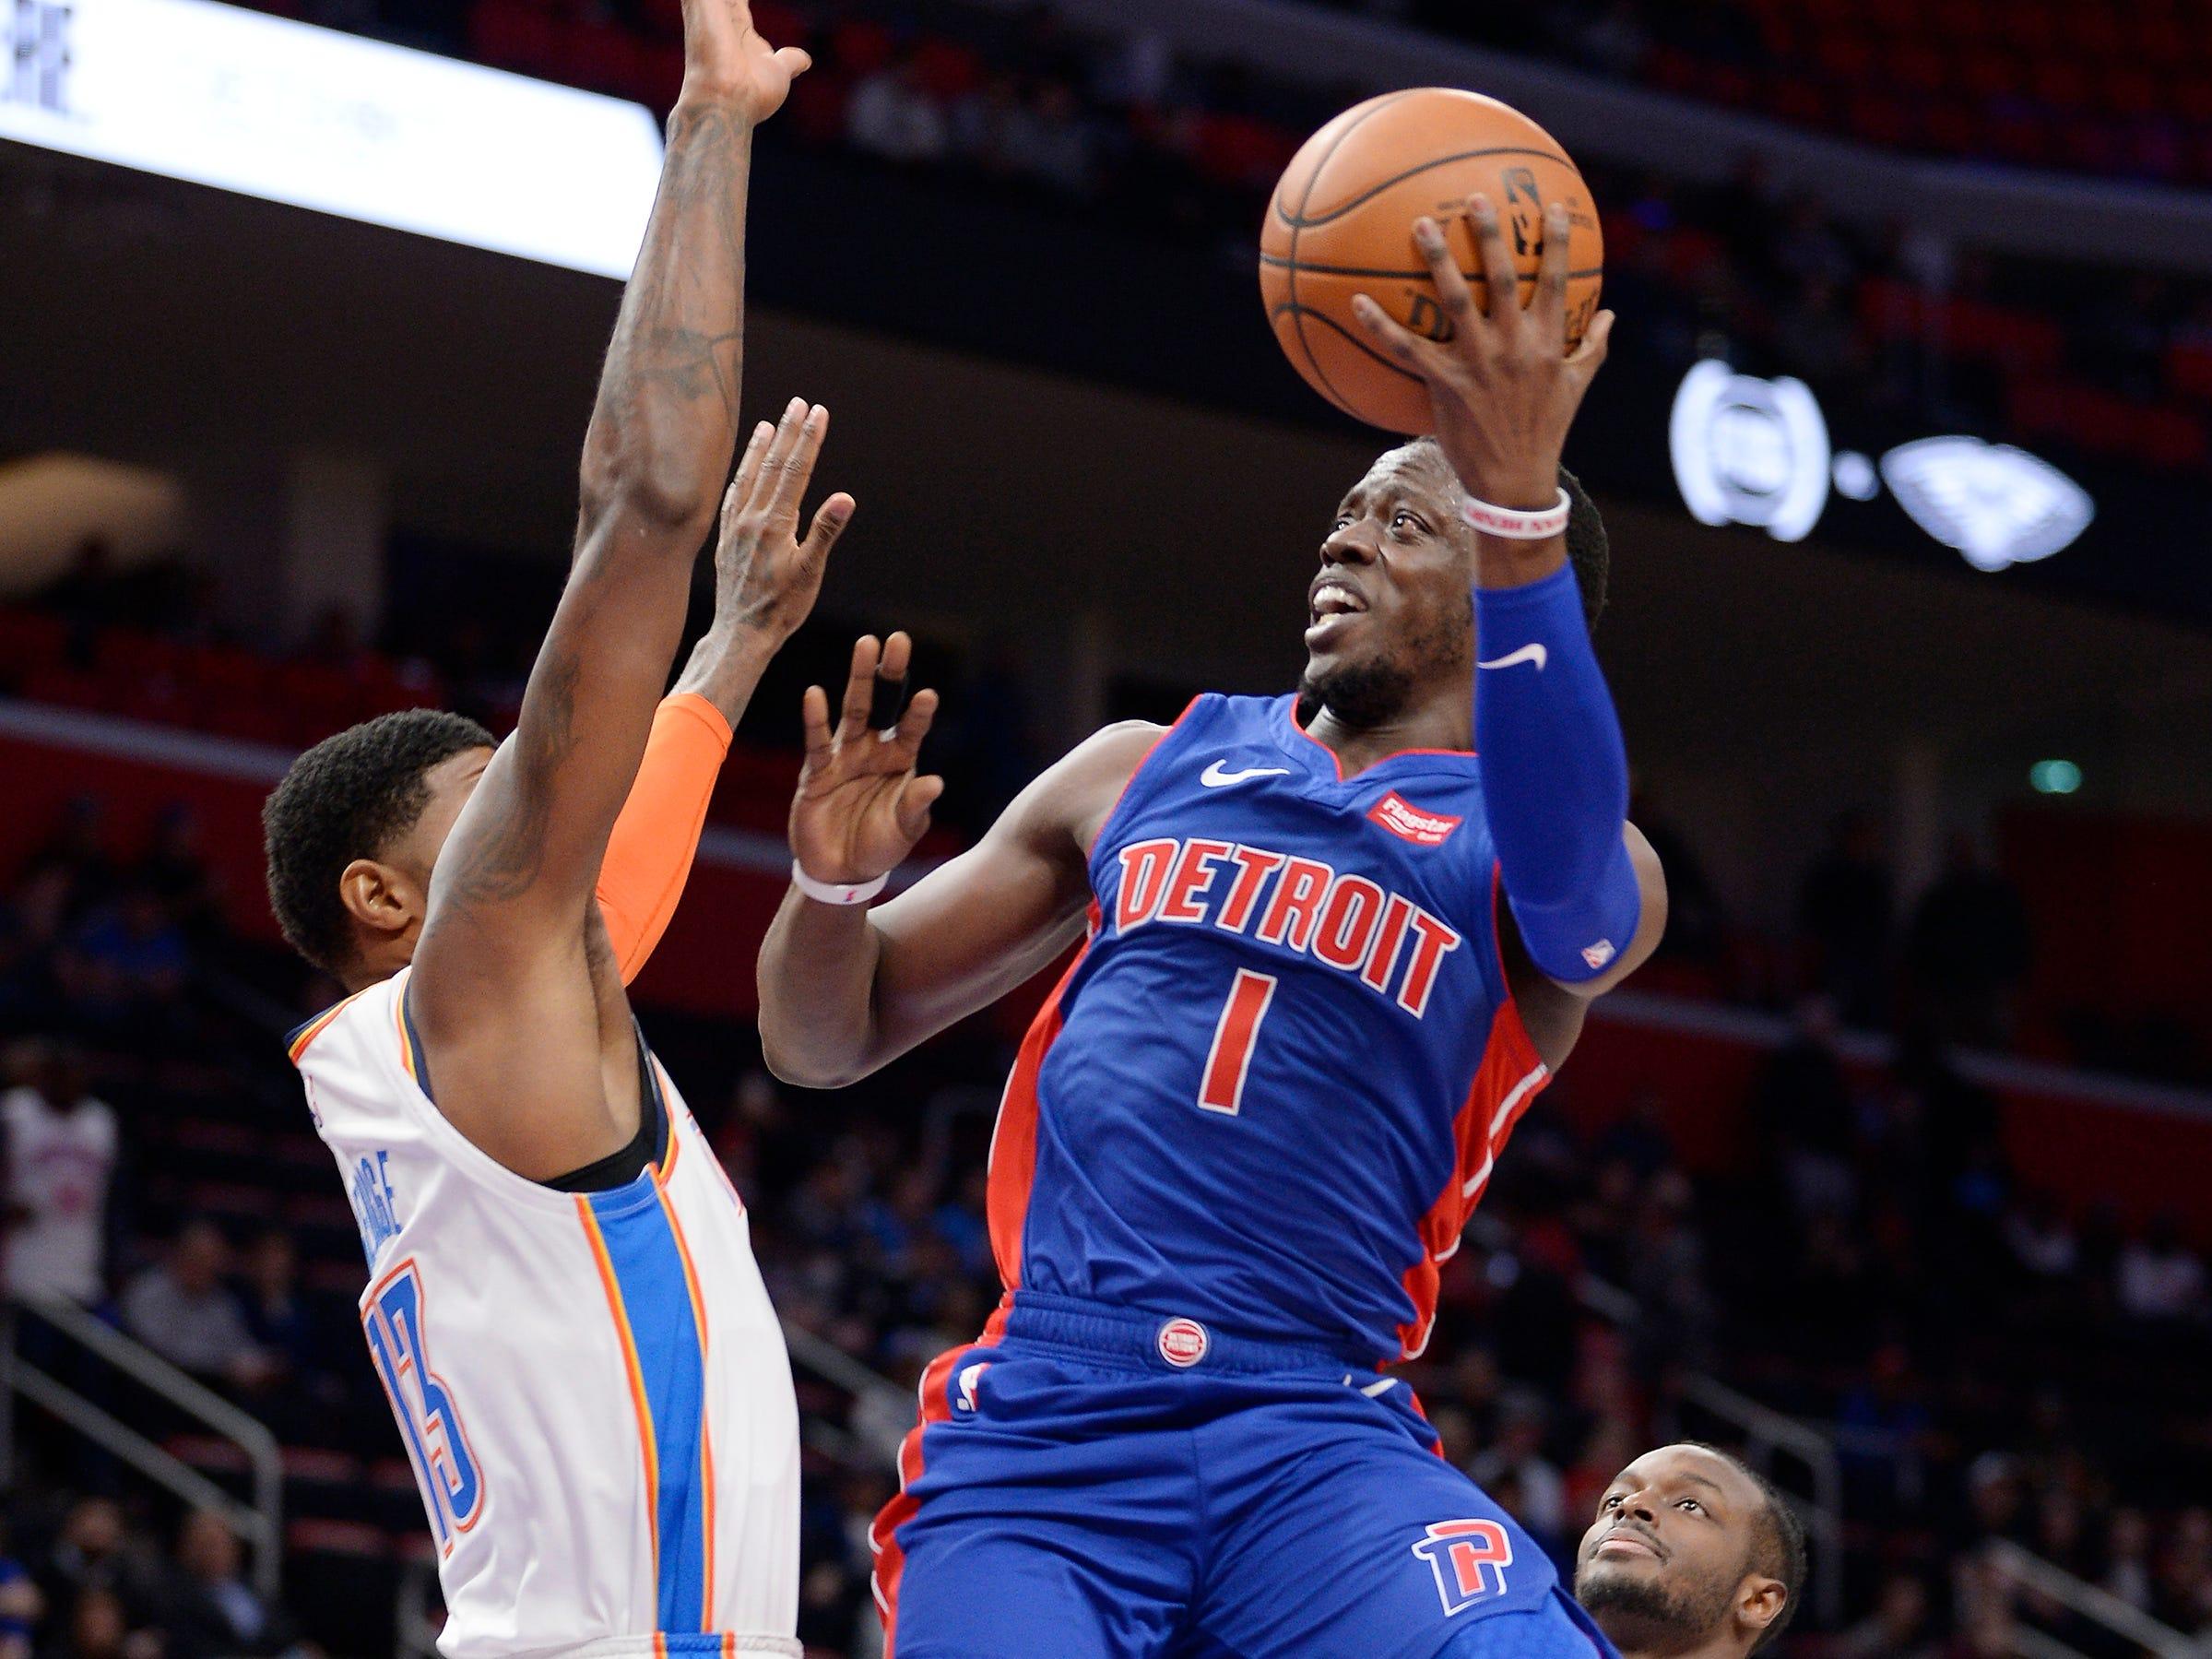 Pistons' Reggie Jackson scores over Oklahoma City Thunder's Paul George in the first quarter.